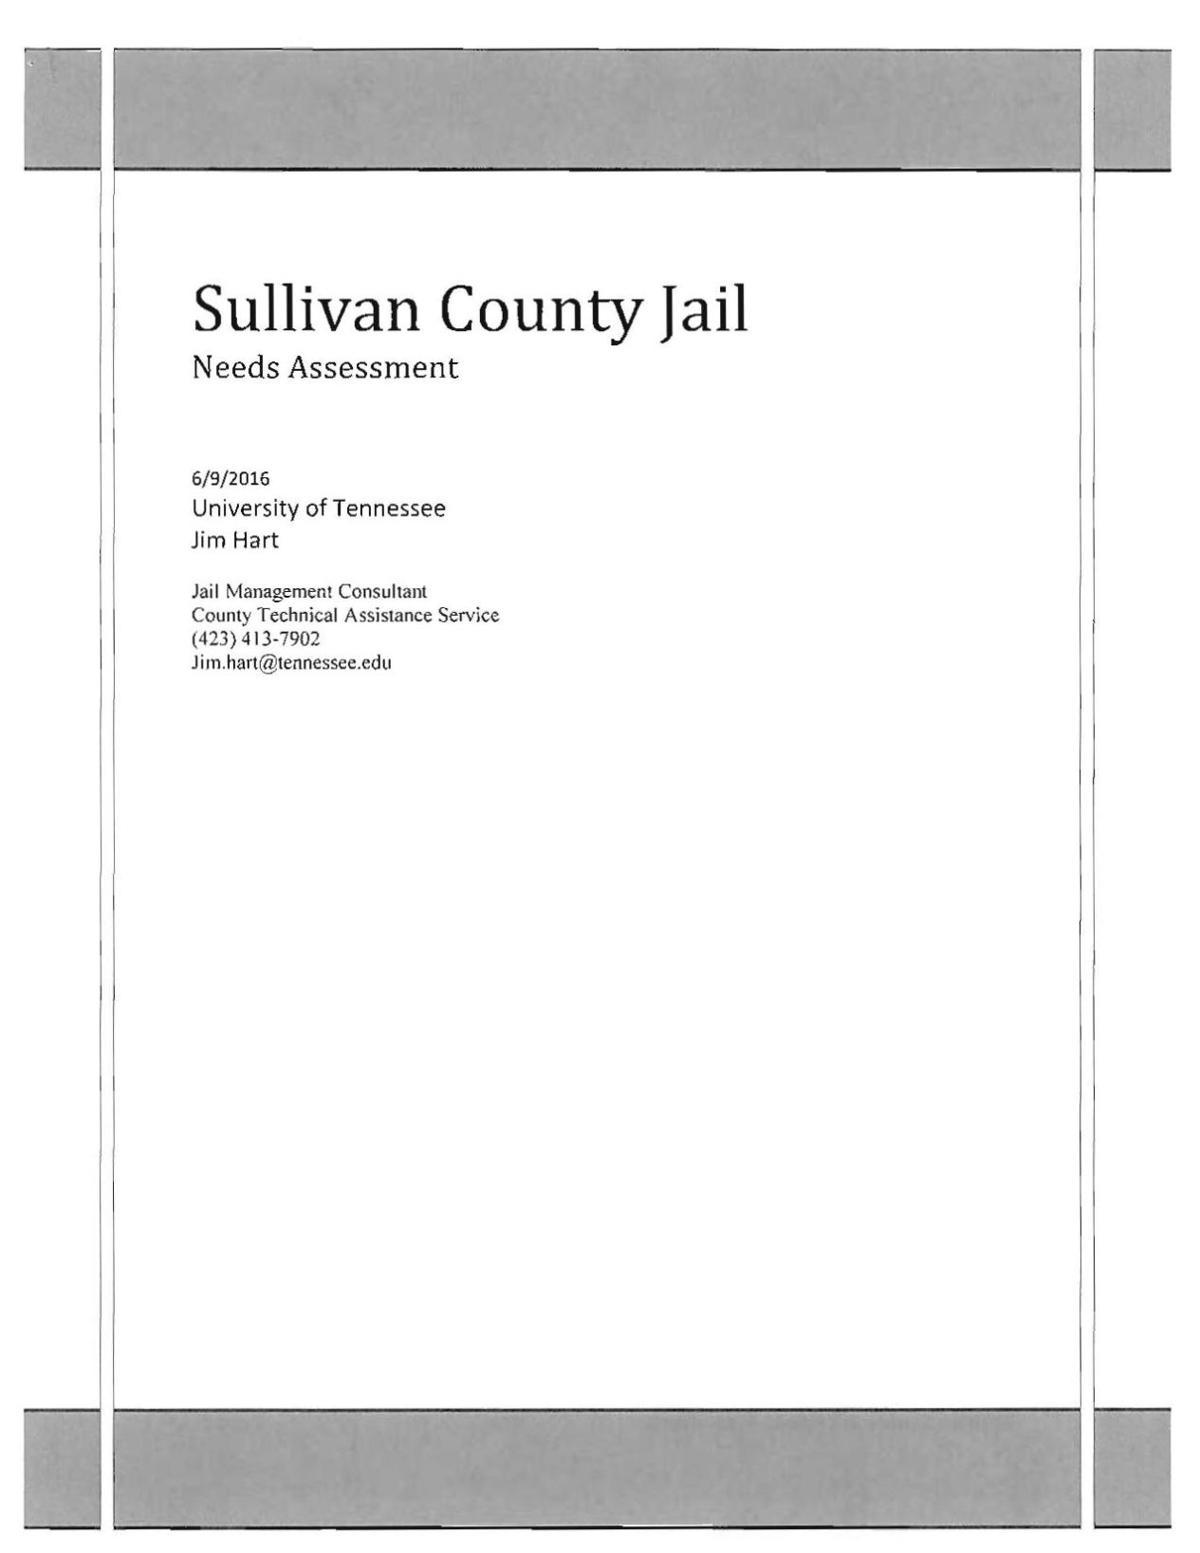 Needs Assessment Report from Jim Hart